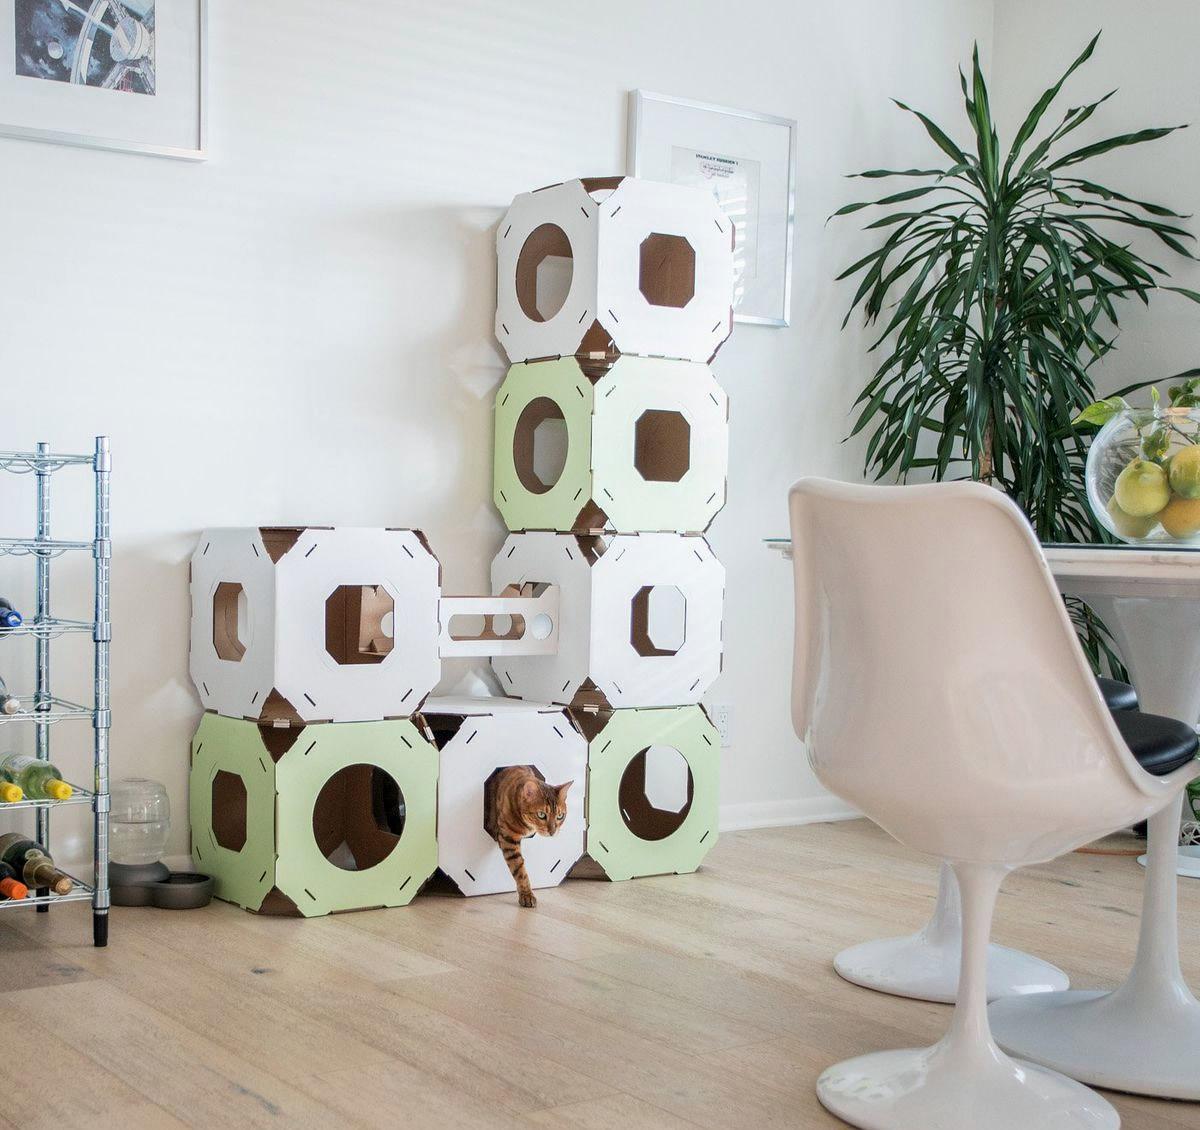 Casa modulare di cartone